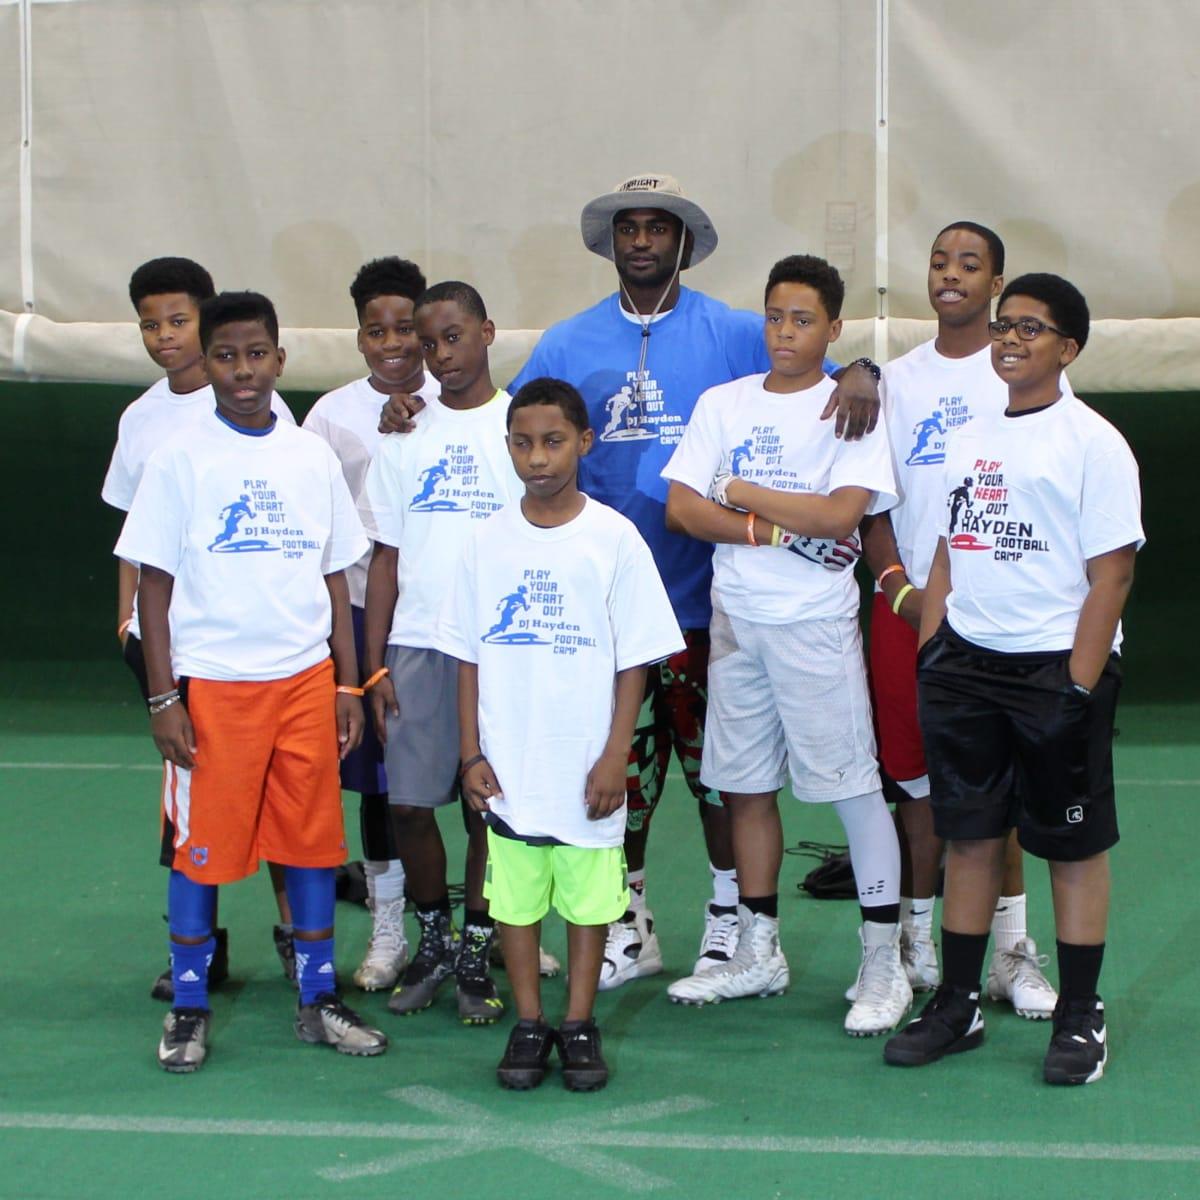 DJ Hayden Football Camp 2015 group